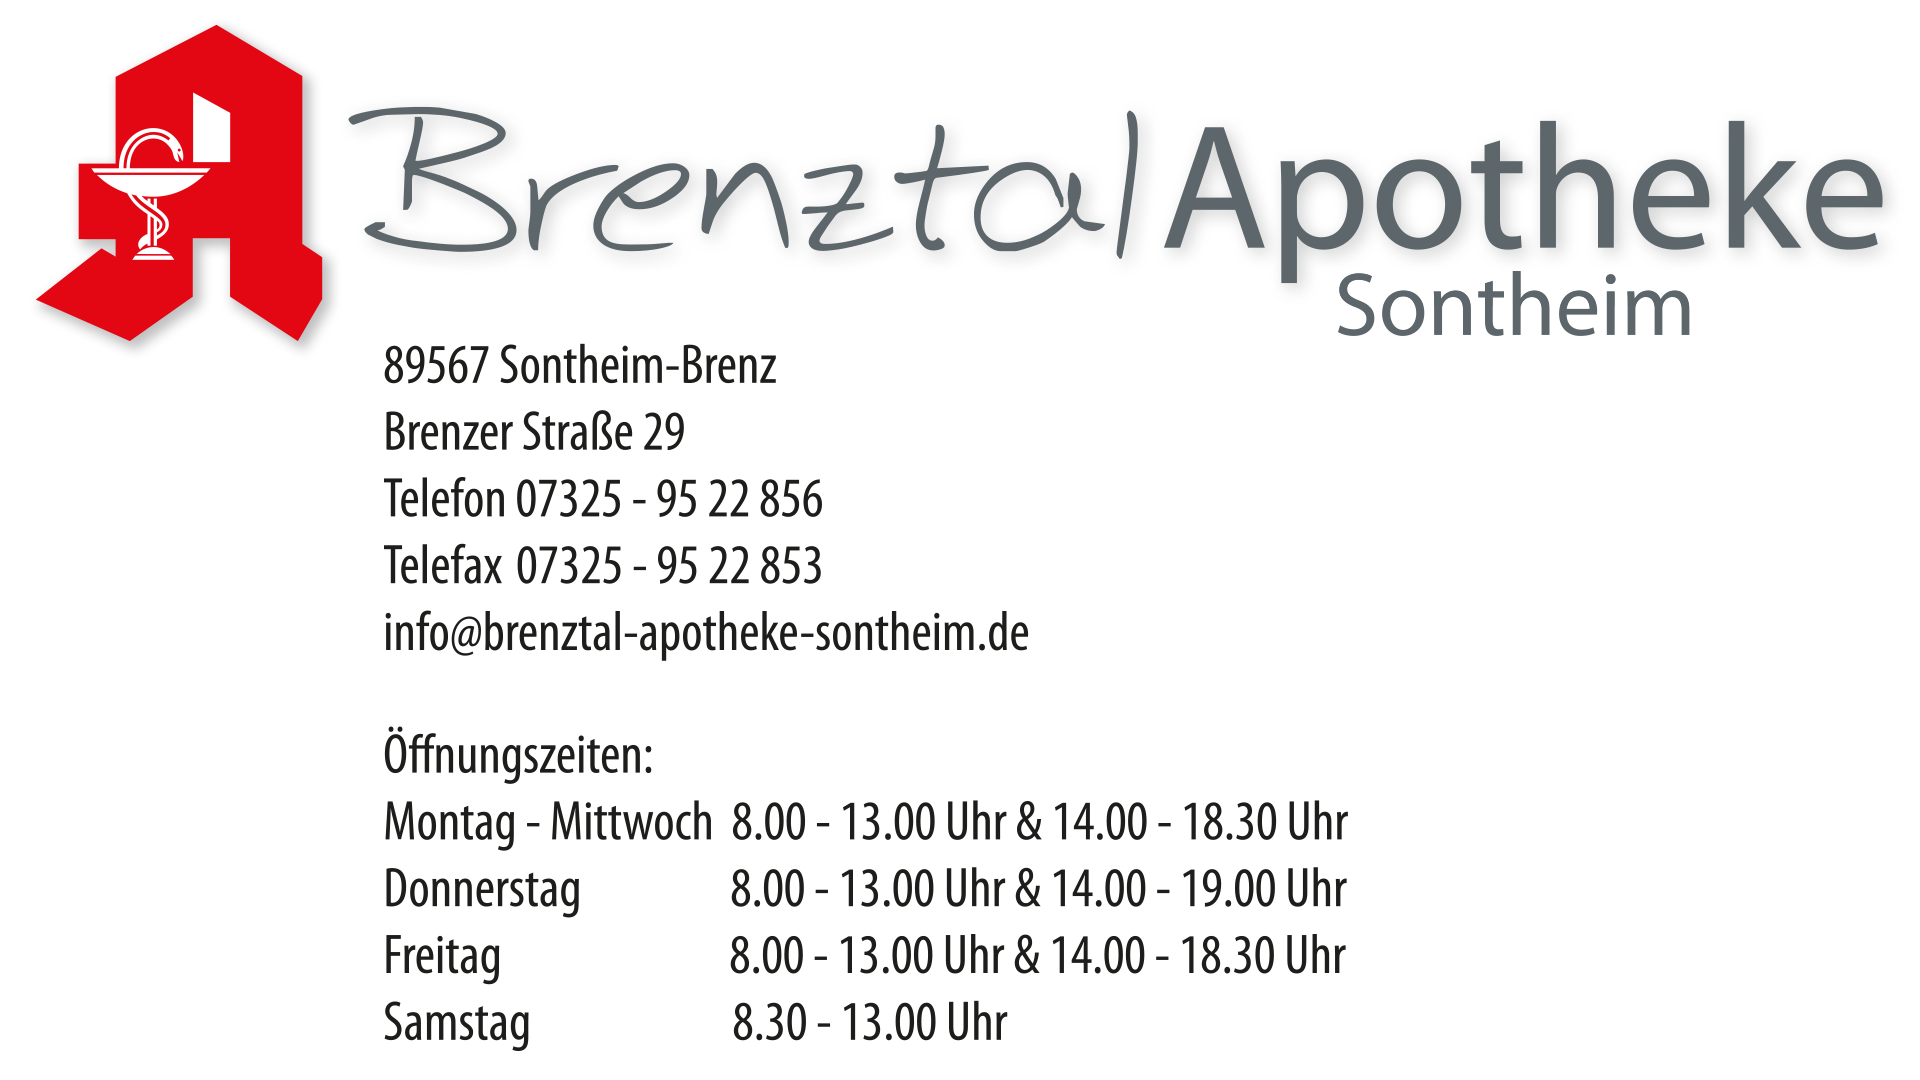 Brenztal Apotheke